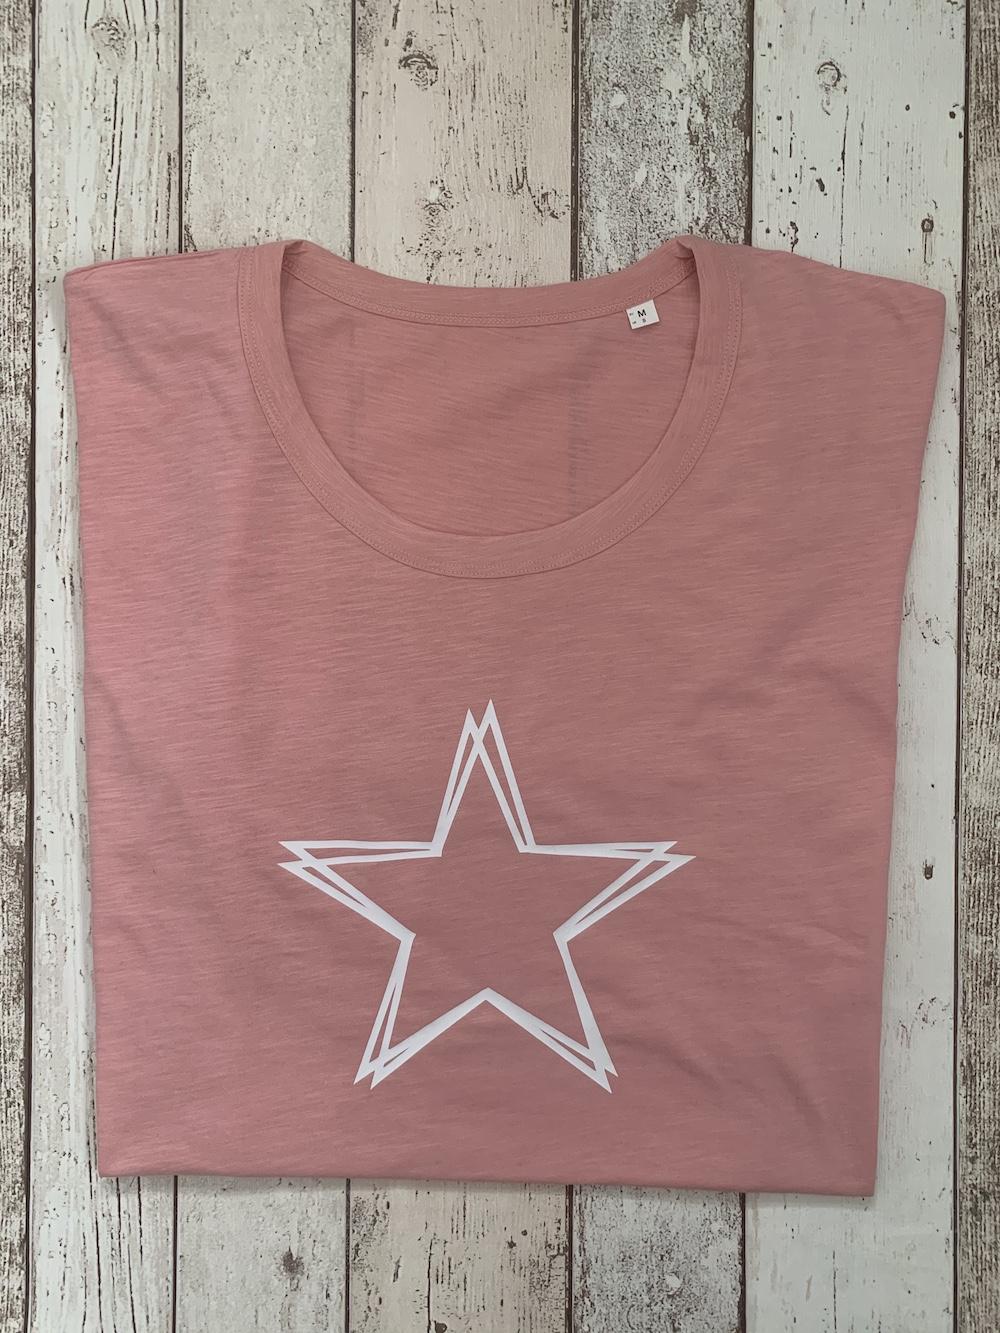 ORGANIC – Star Lightweight Tshirt – Pink And White